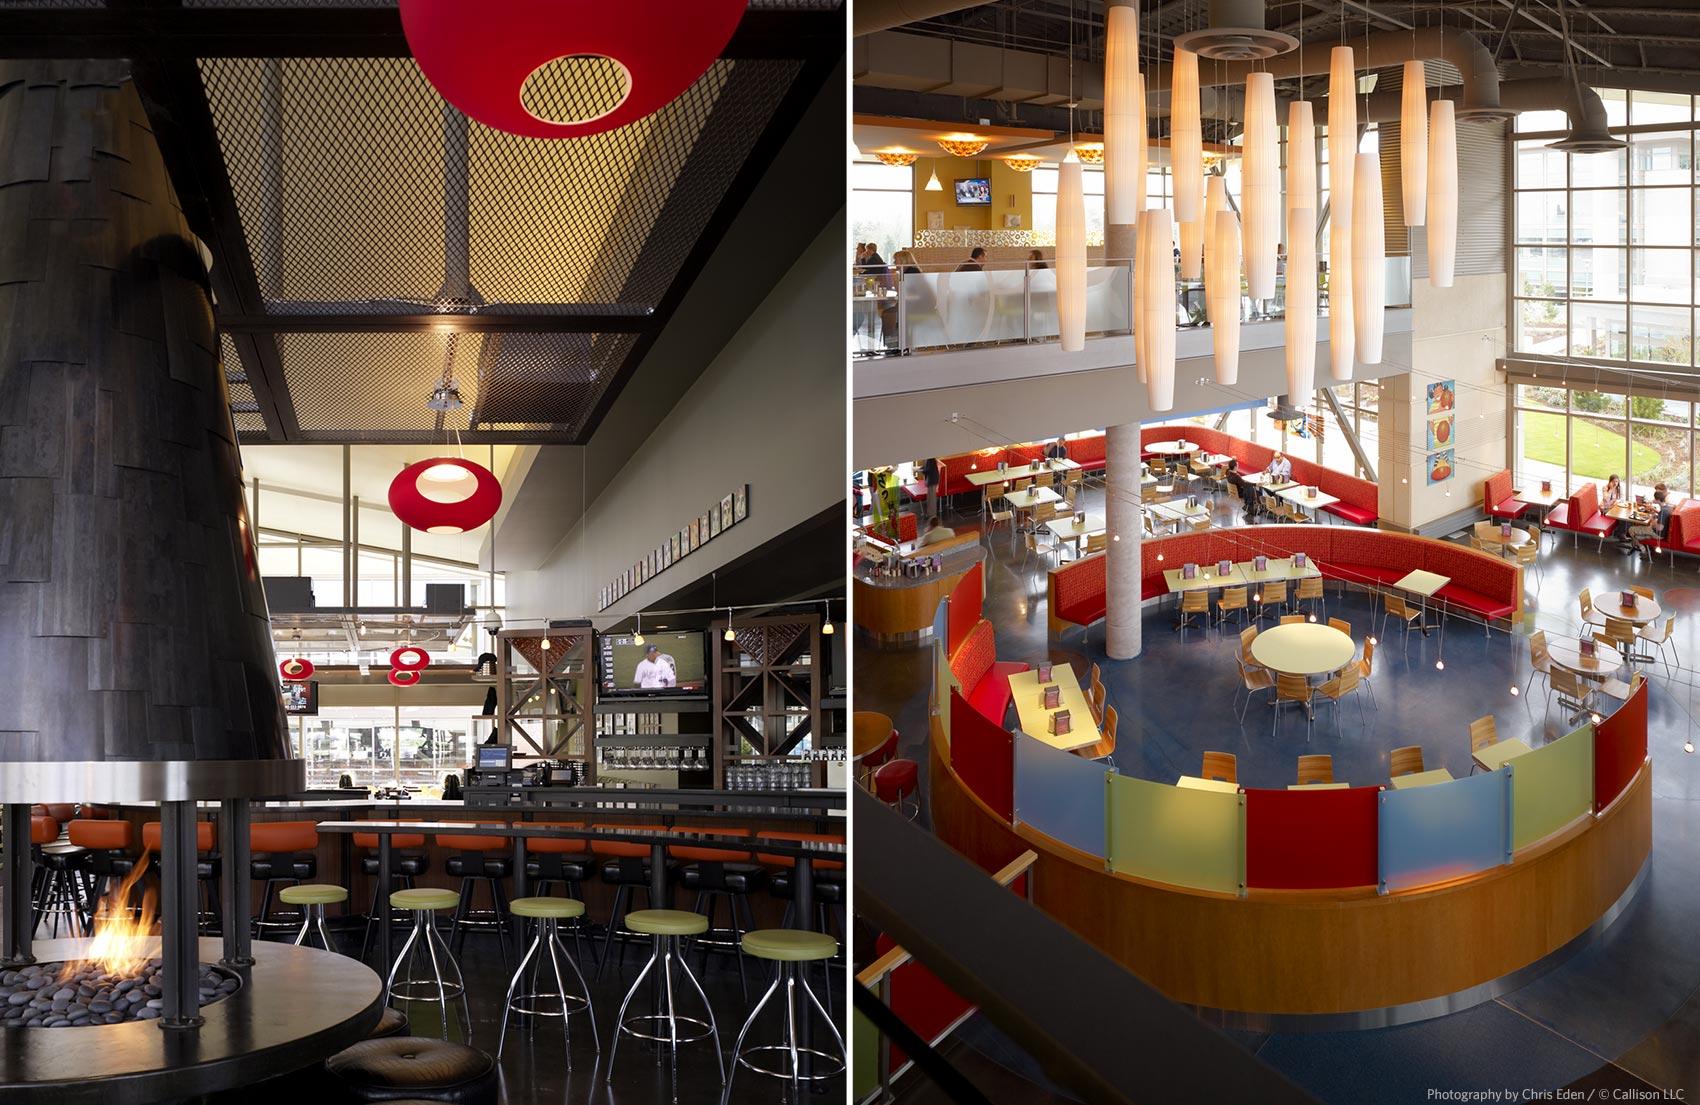 Software Company, Redmond, WA - Corporate restaurant spaces